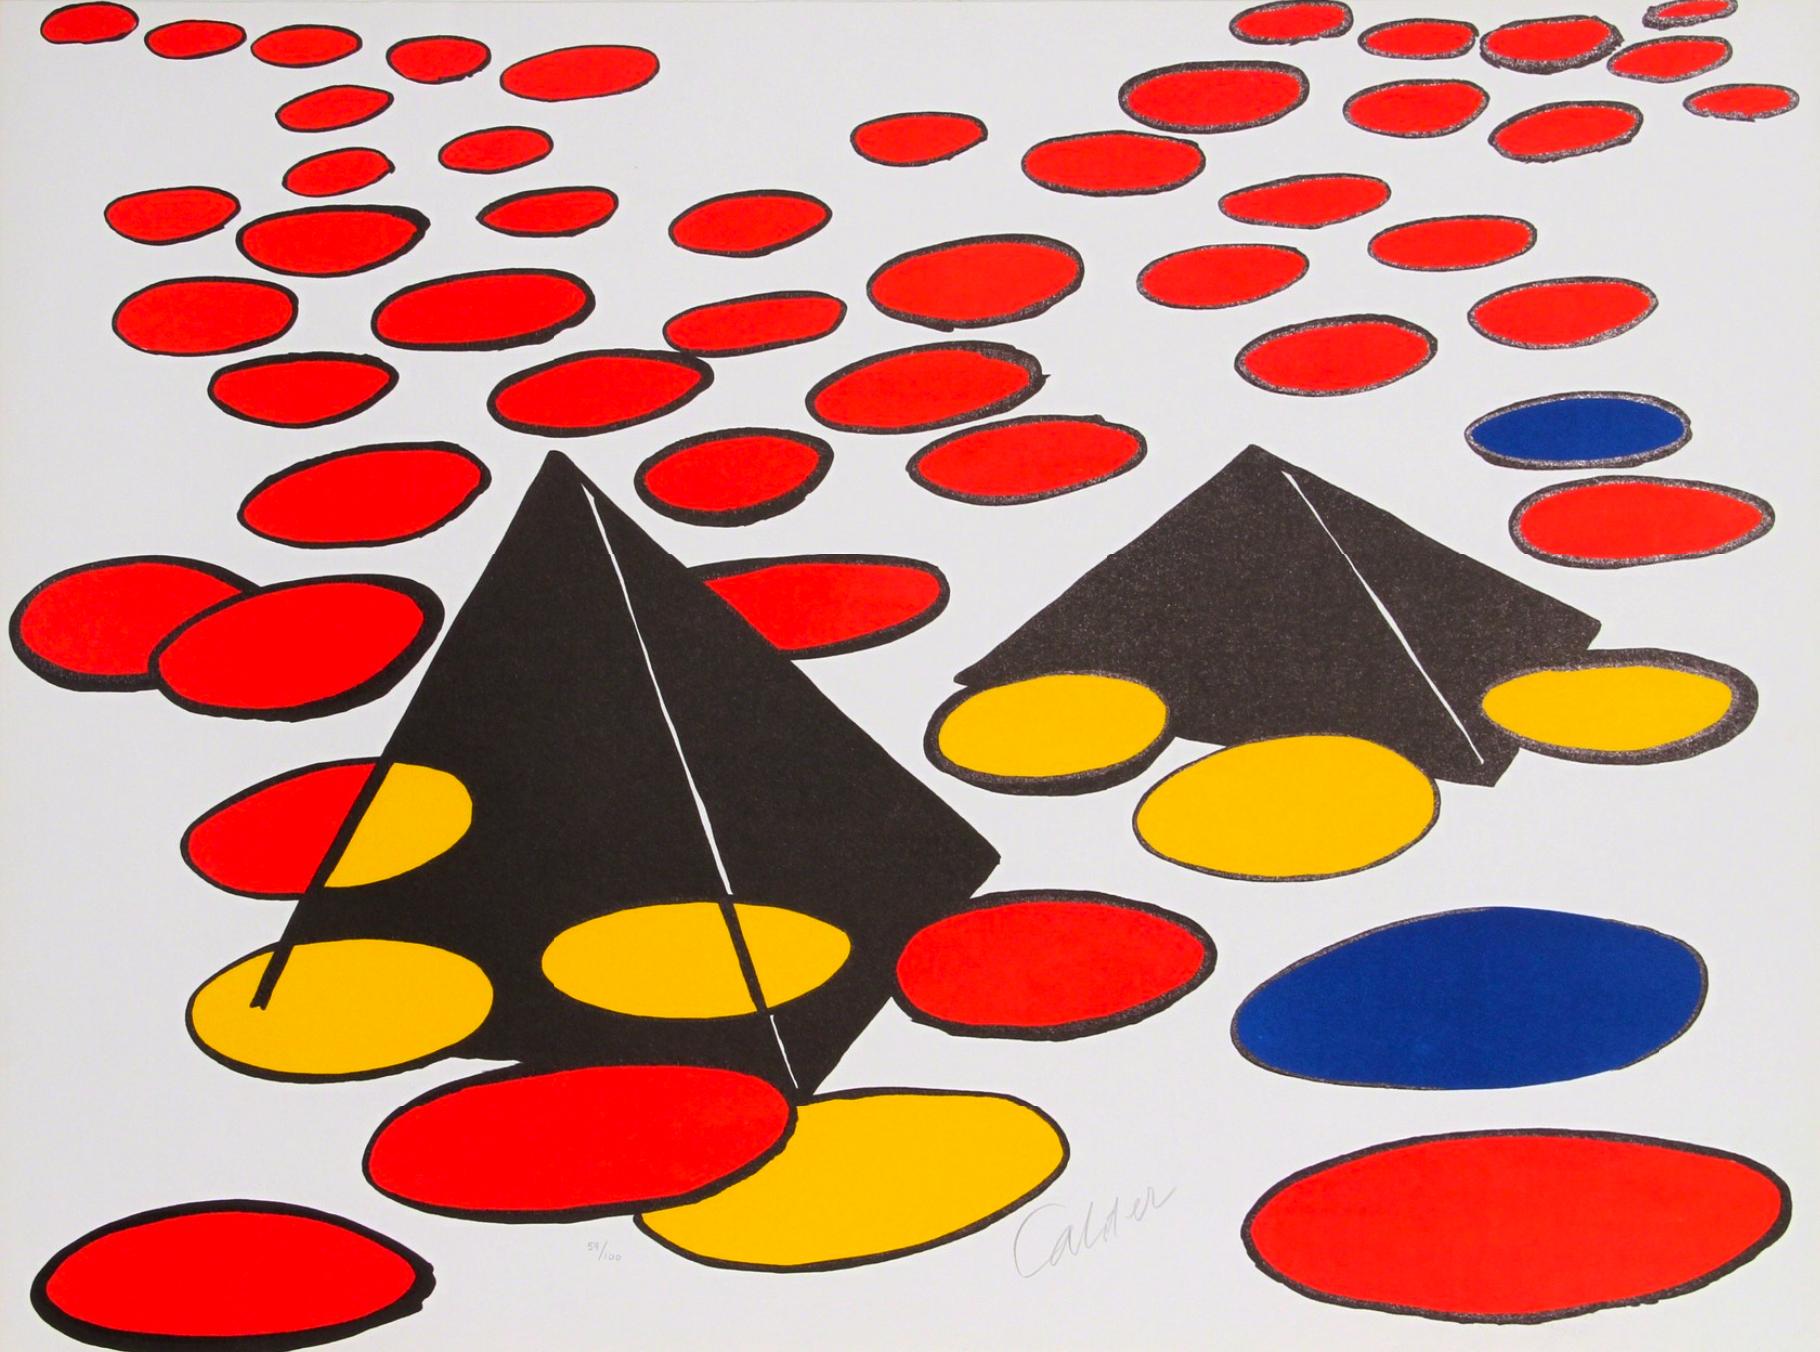 Black Pyramids by Alexander Calder